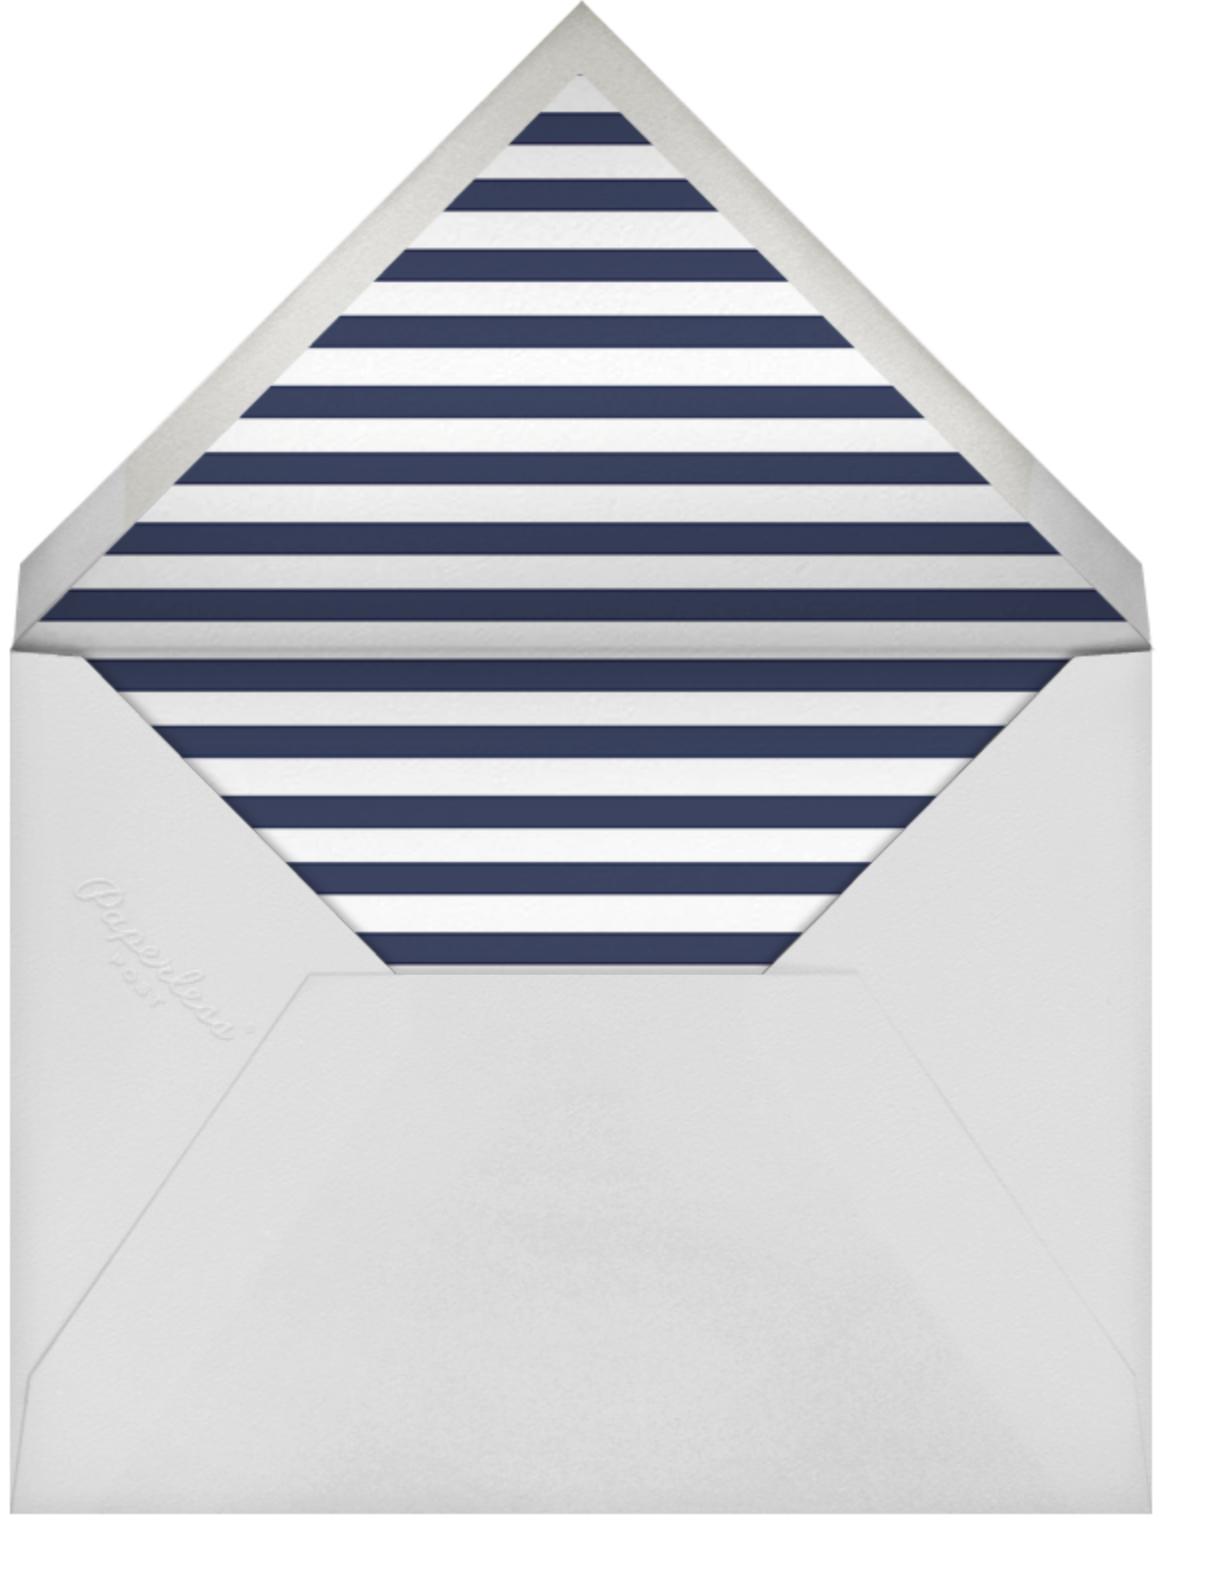 Confetti - Navy/Silver - kate spade new york - Winter parties - envelope back